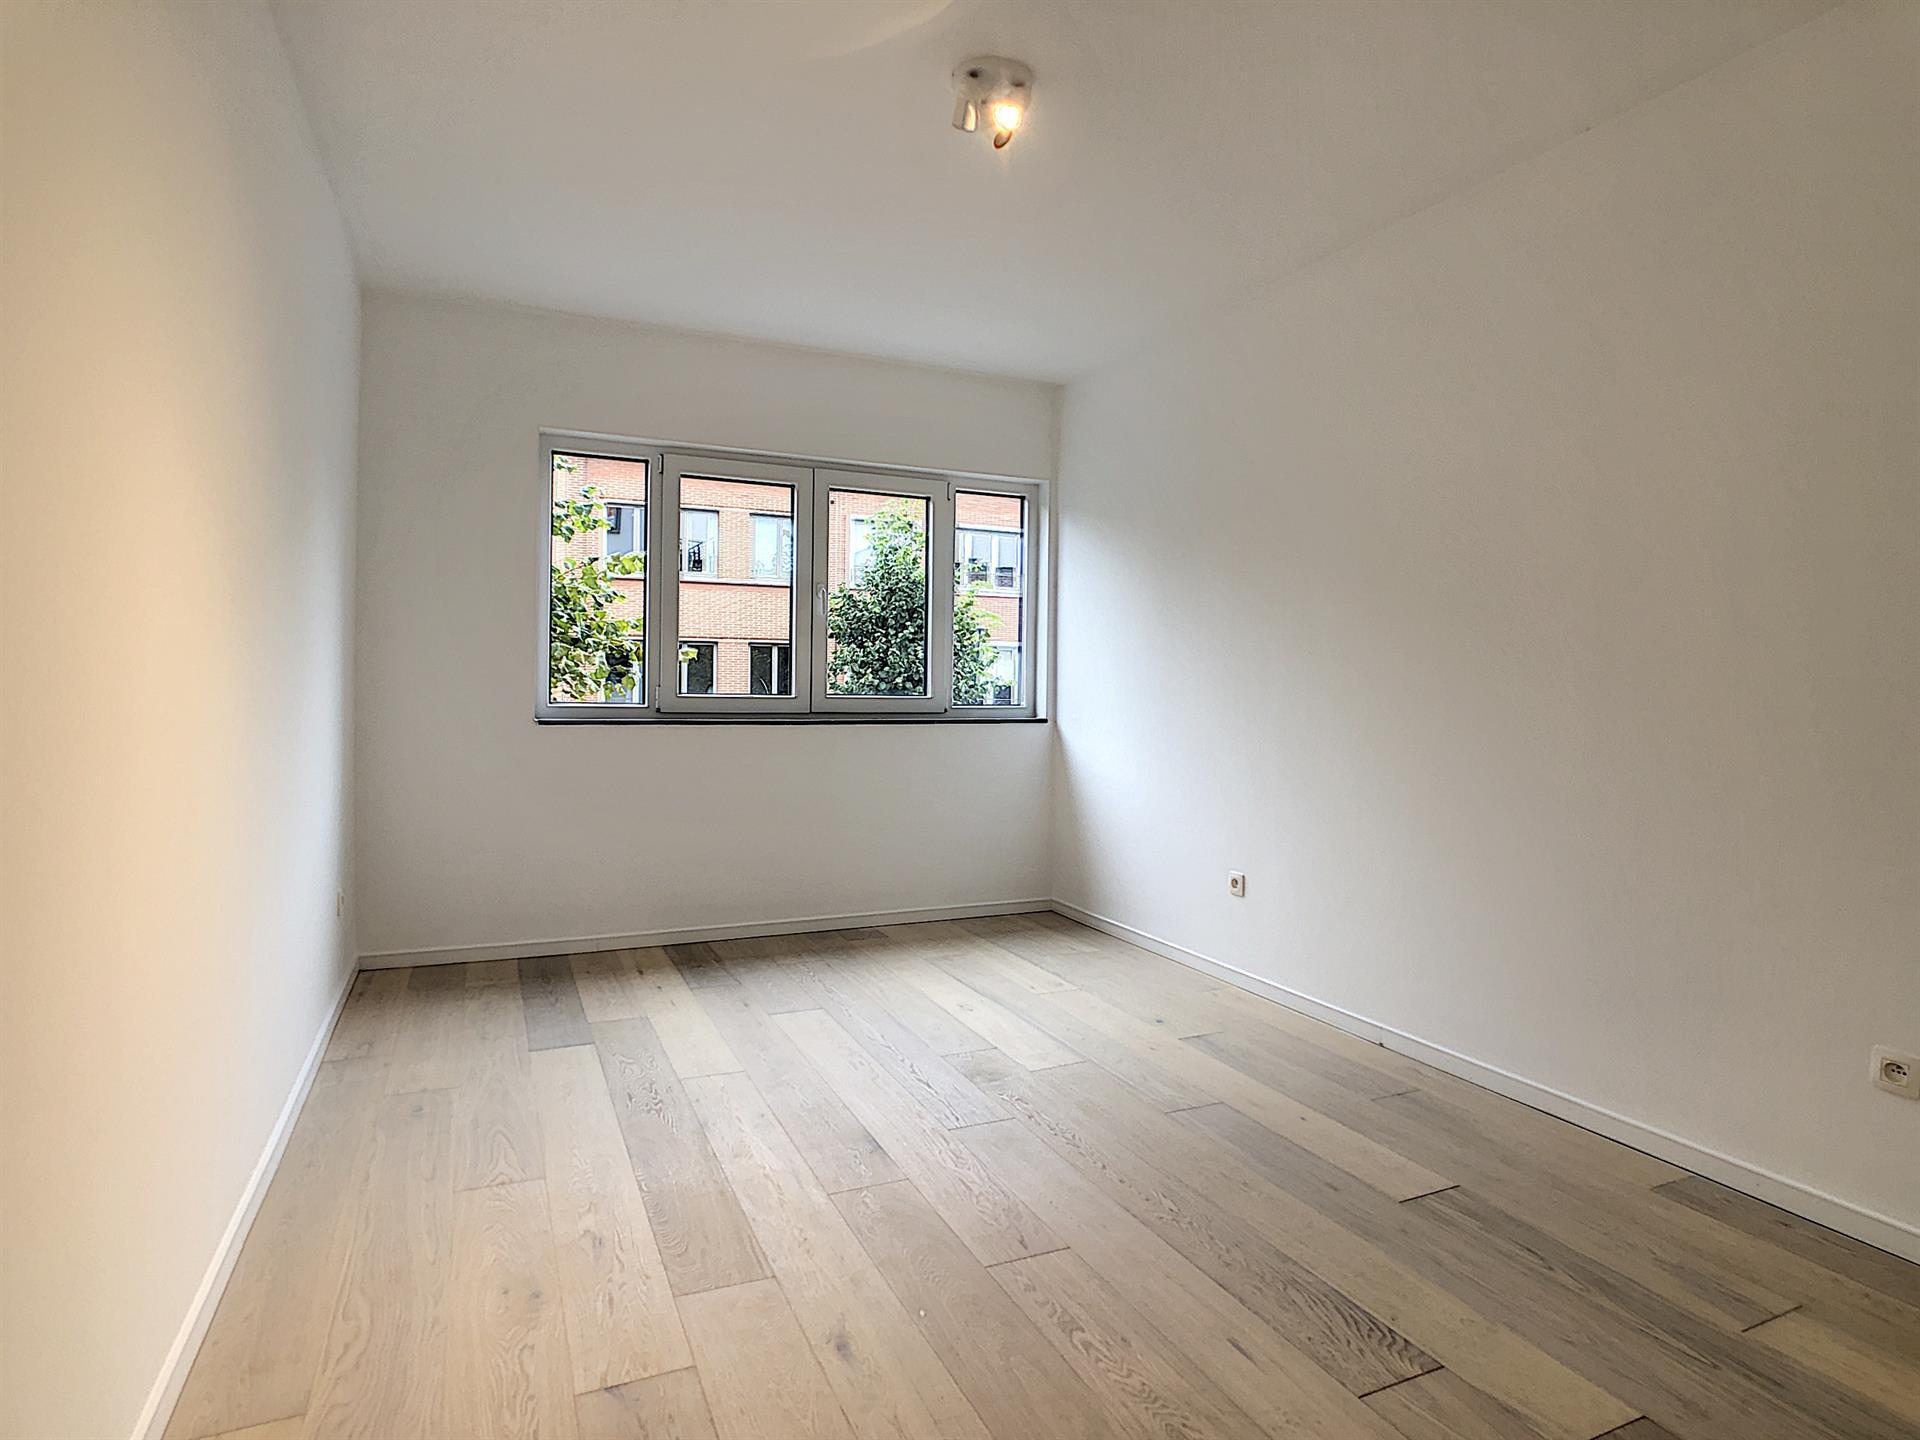 Appartement - Anderlecht - #4252376-36